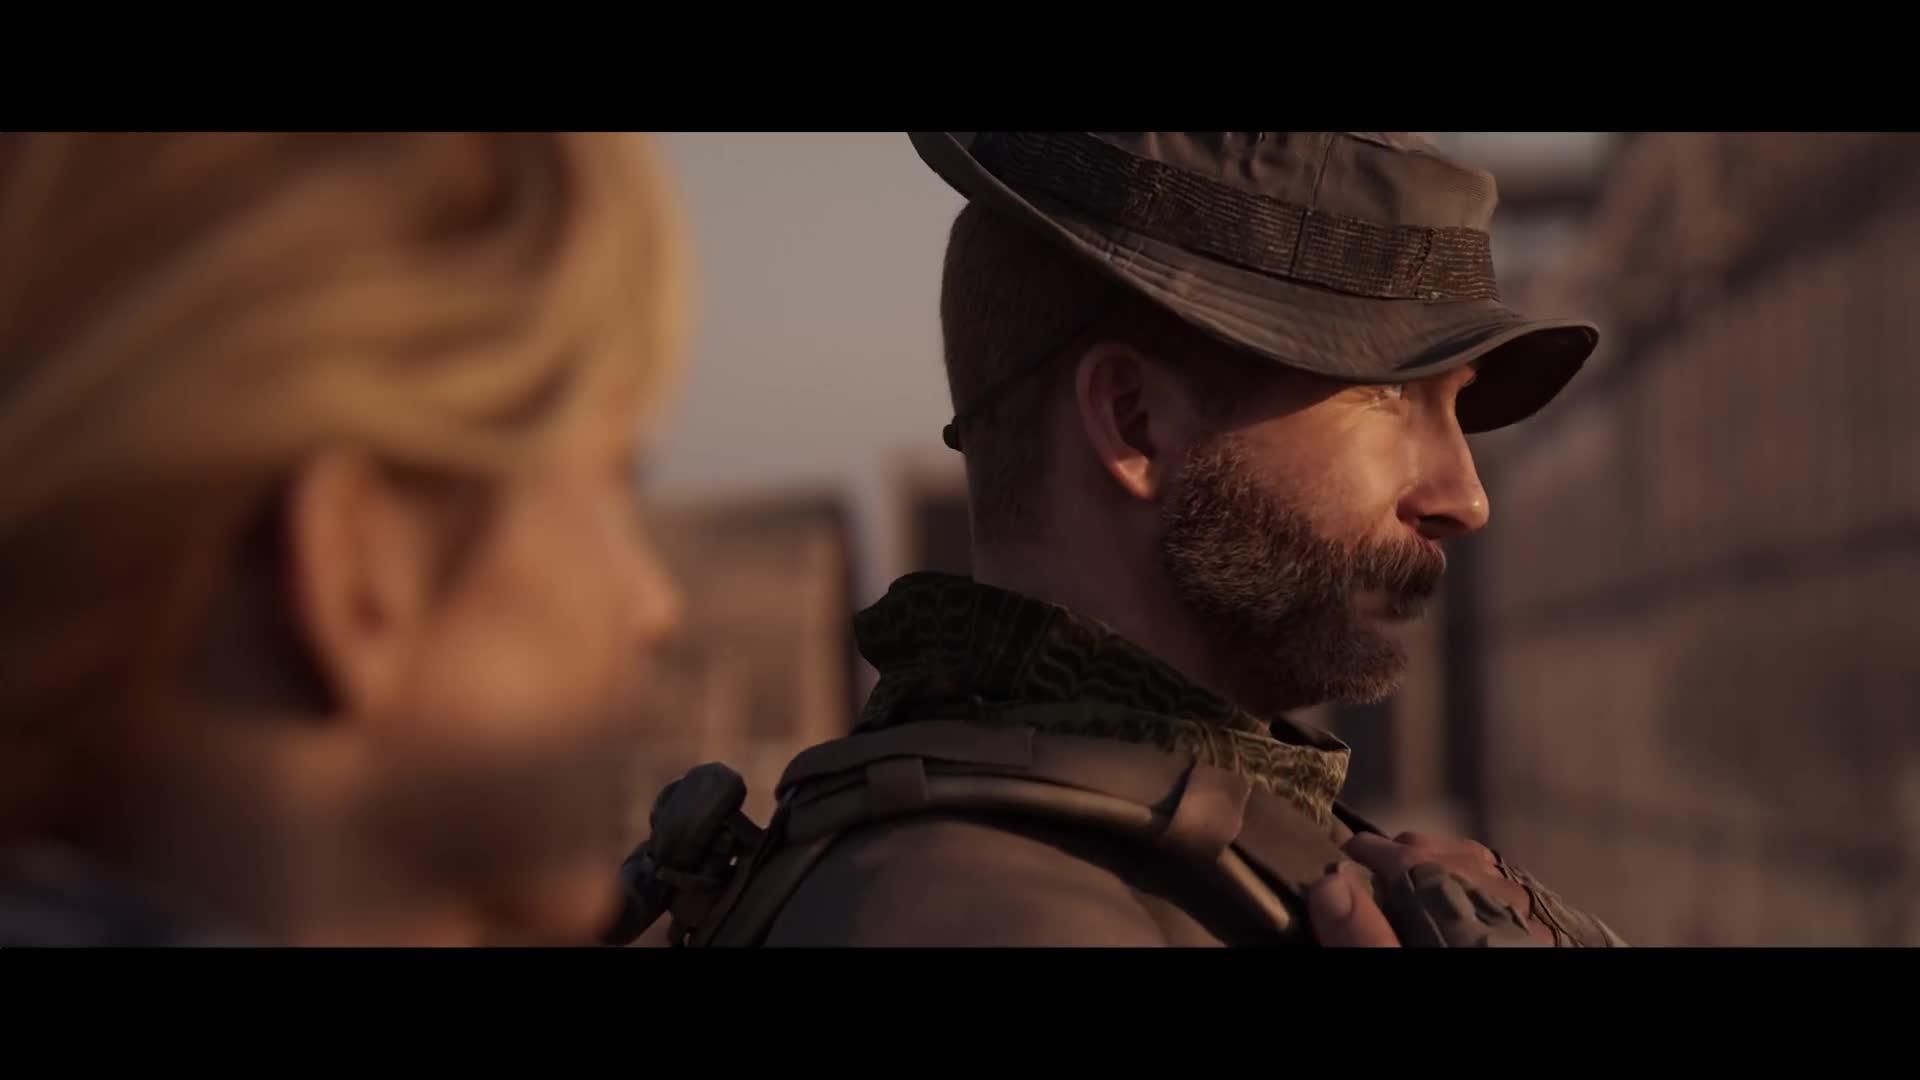 Call of Duty: Modern Warfare - Story Trailer [HD] screen capture